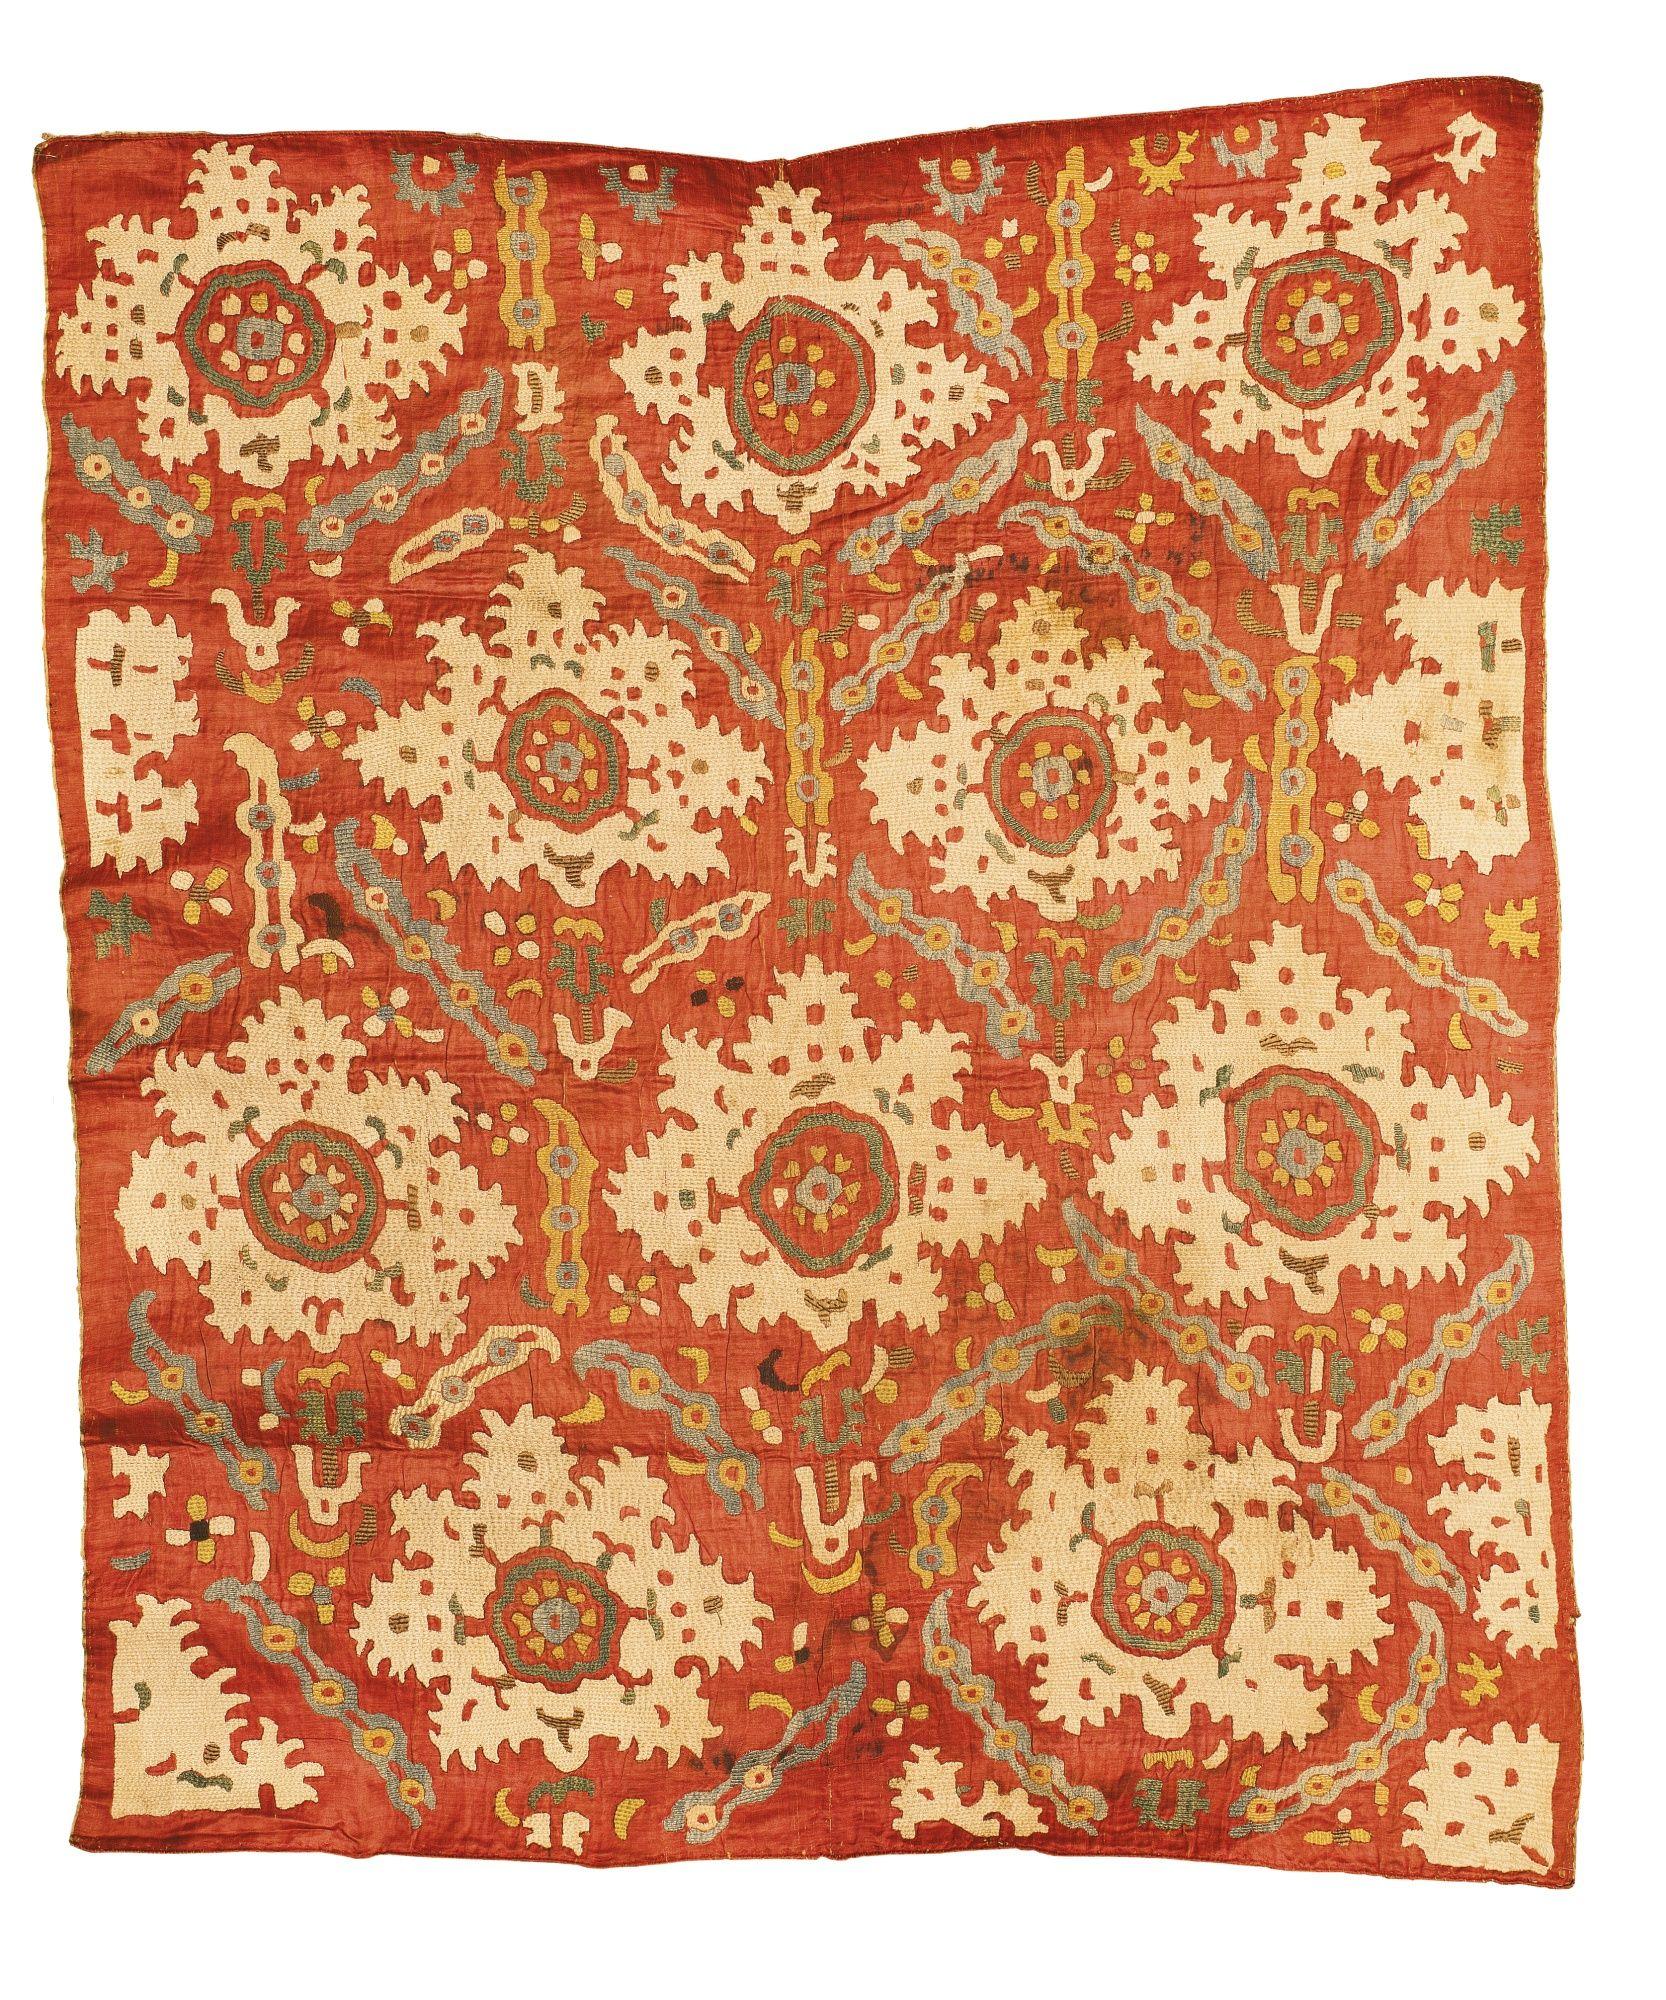 Embroidered silk Kaitag, Northeast Caucasus, ca. 1800.